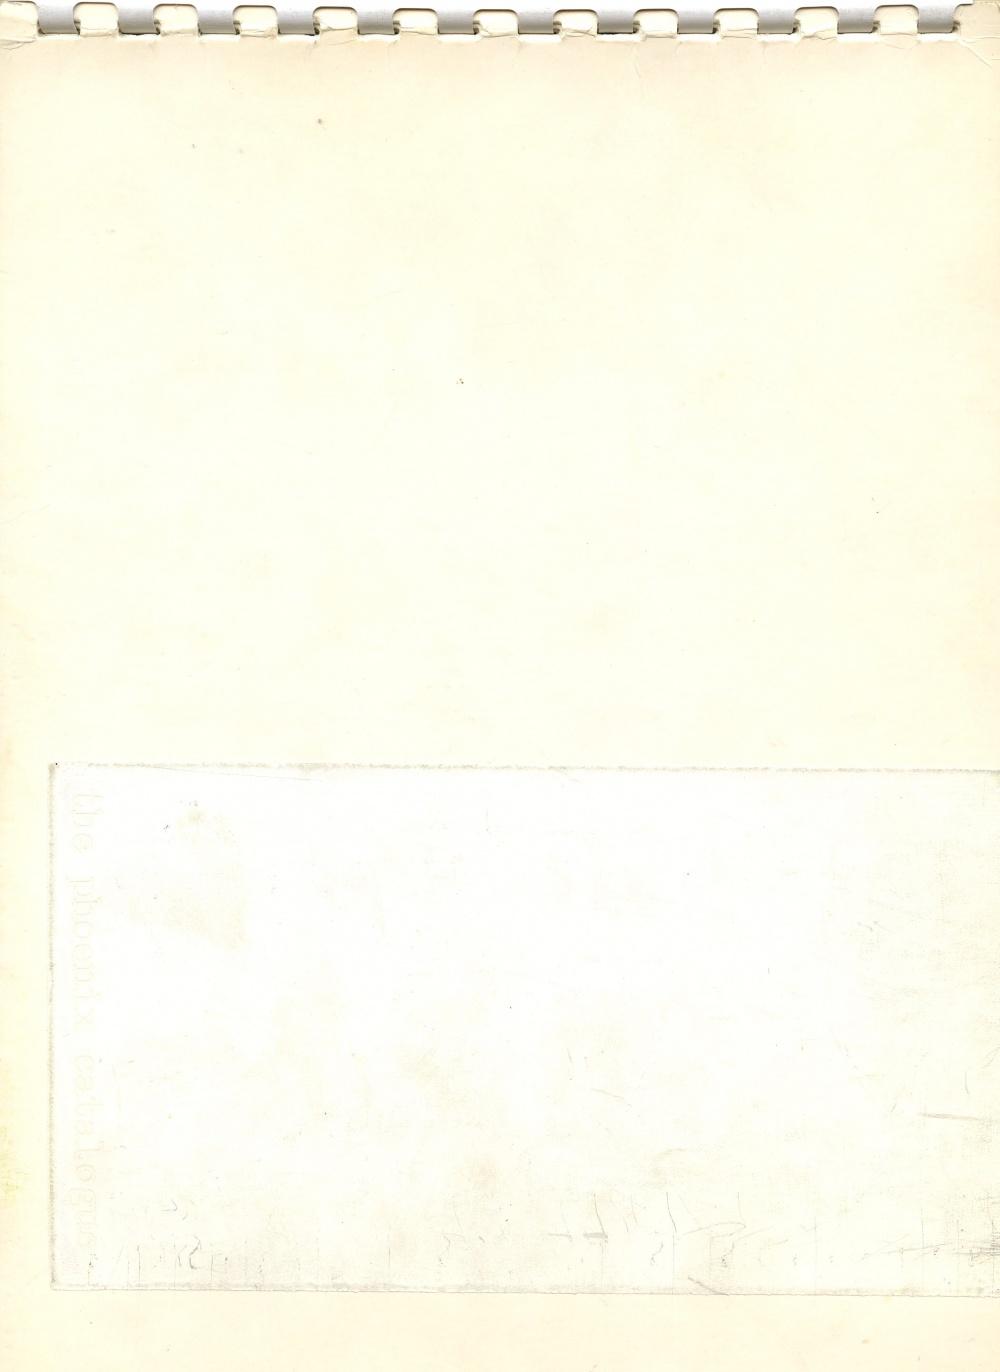 The Phoenix Catalogue Volume 1: An Exploration in Conceptual Art